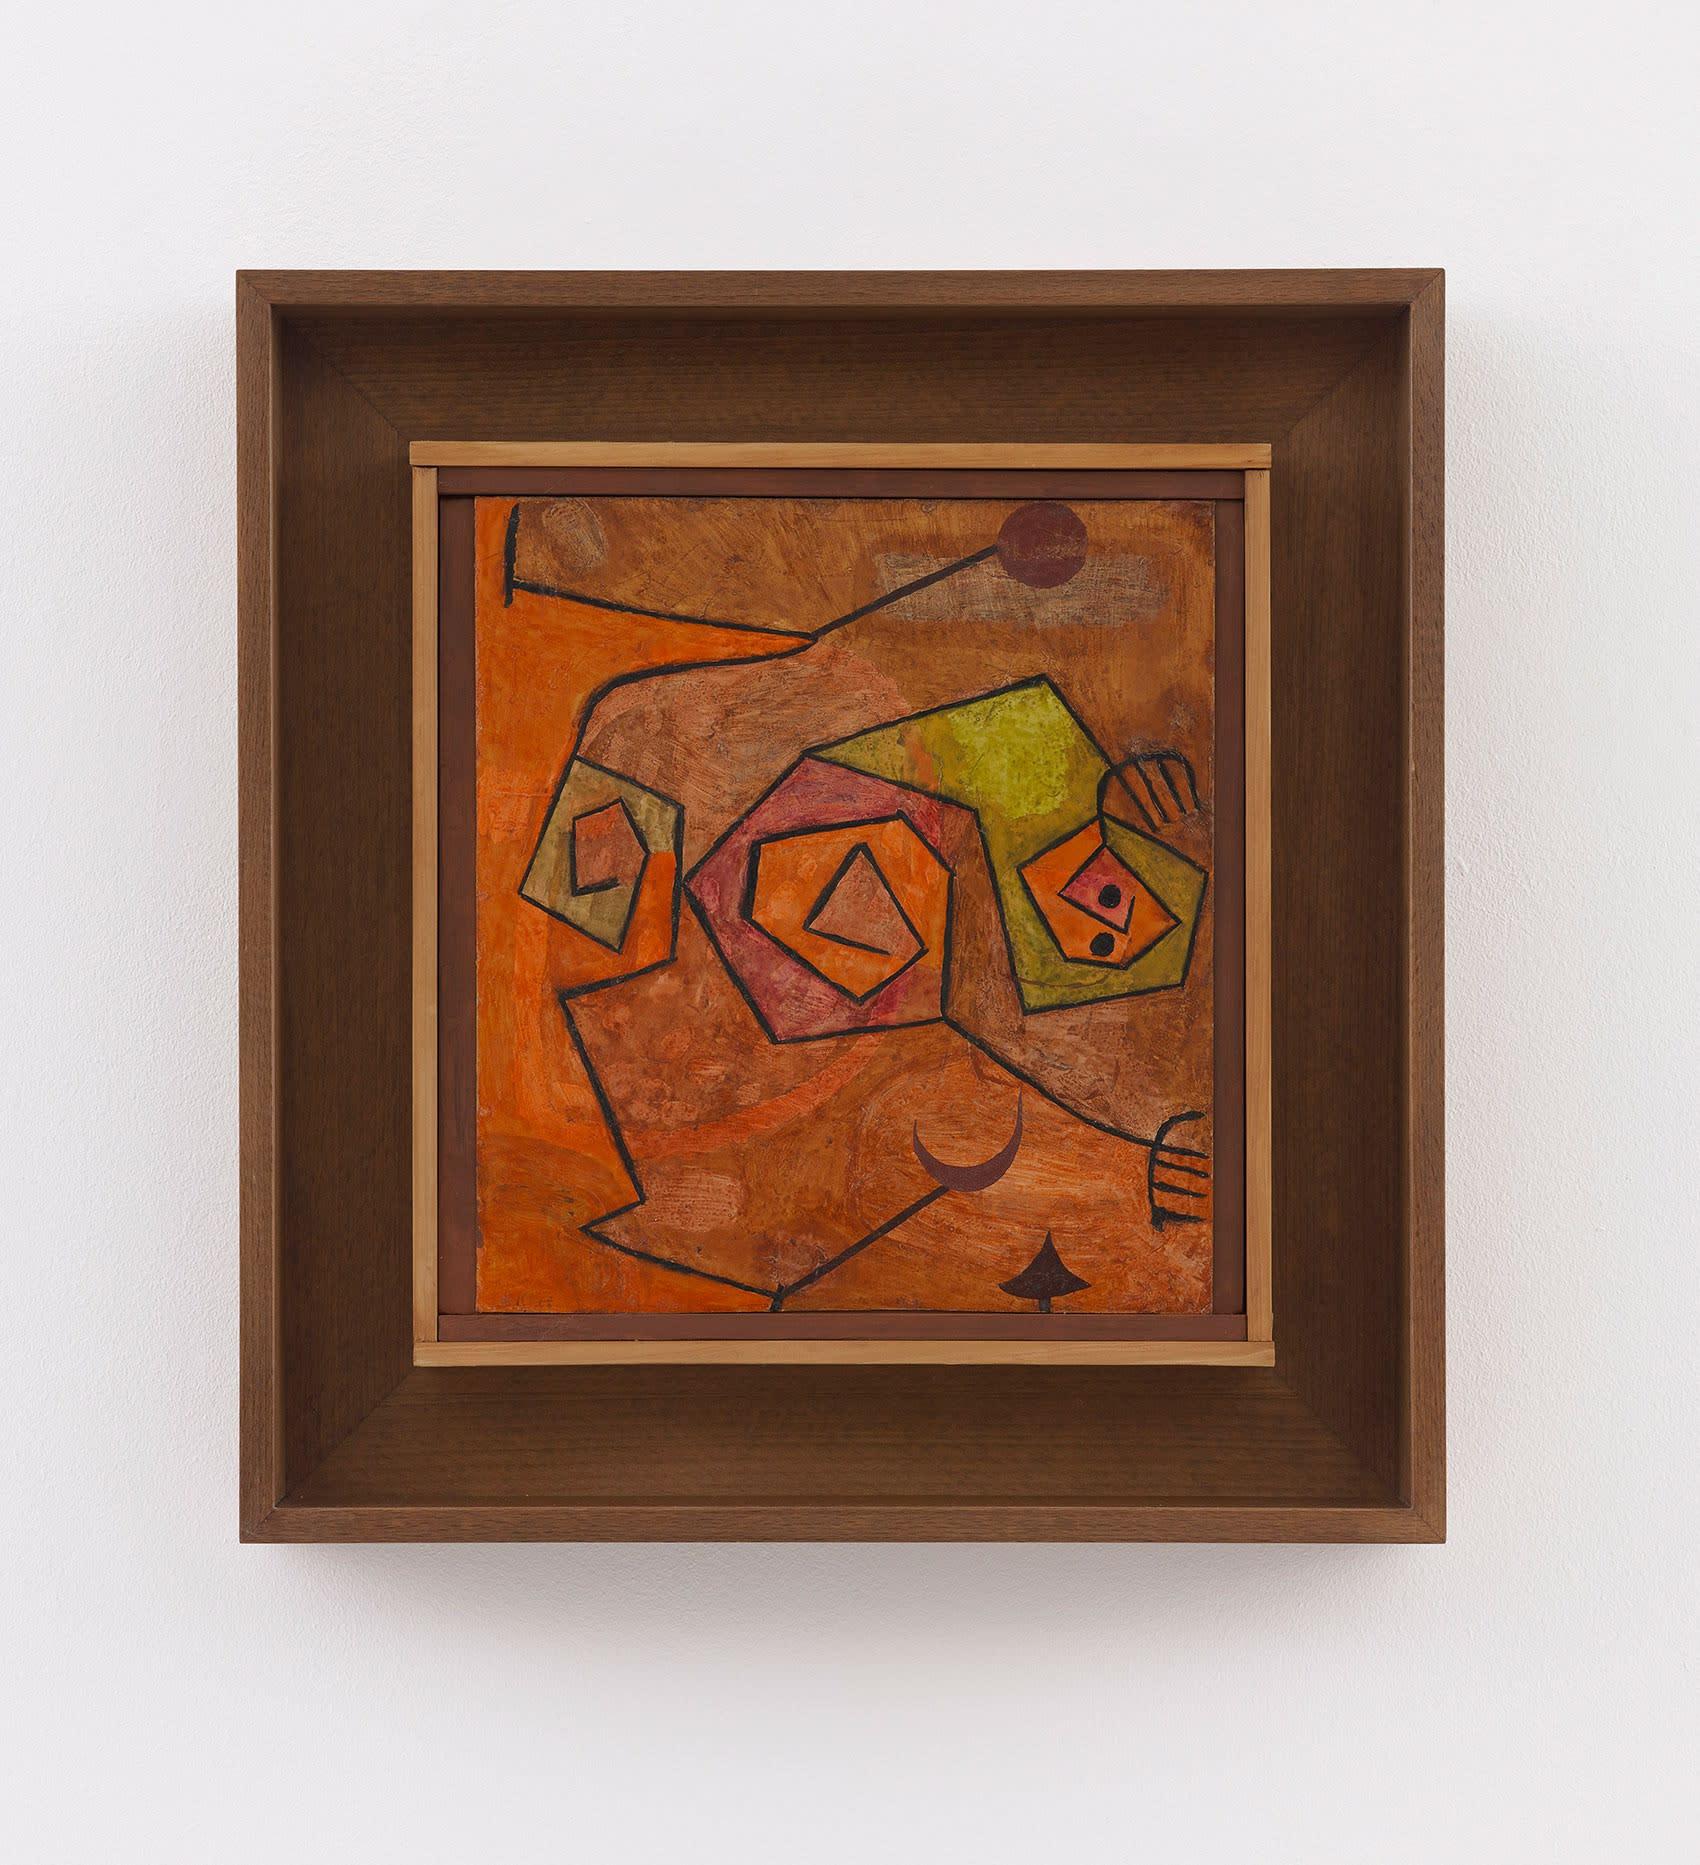 paul klee, folter, torture, 1938, frieze masters, 2020